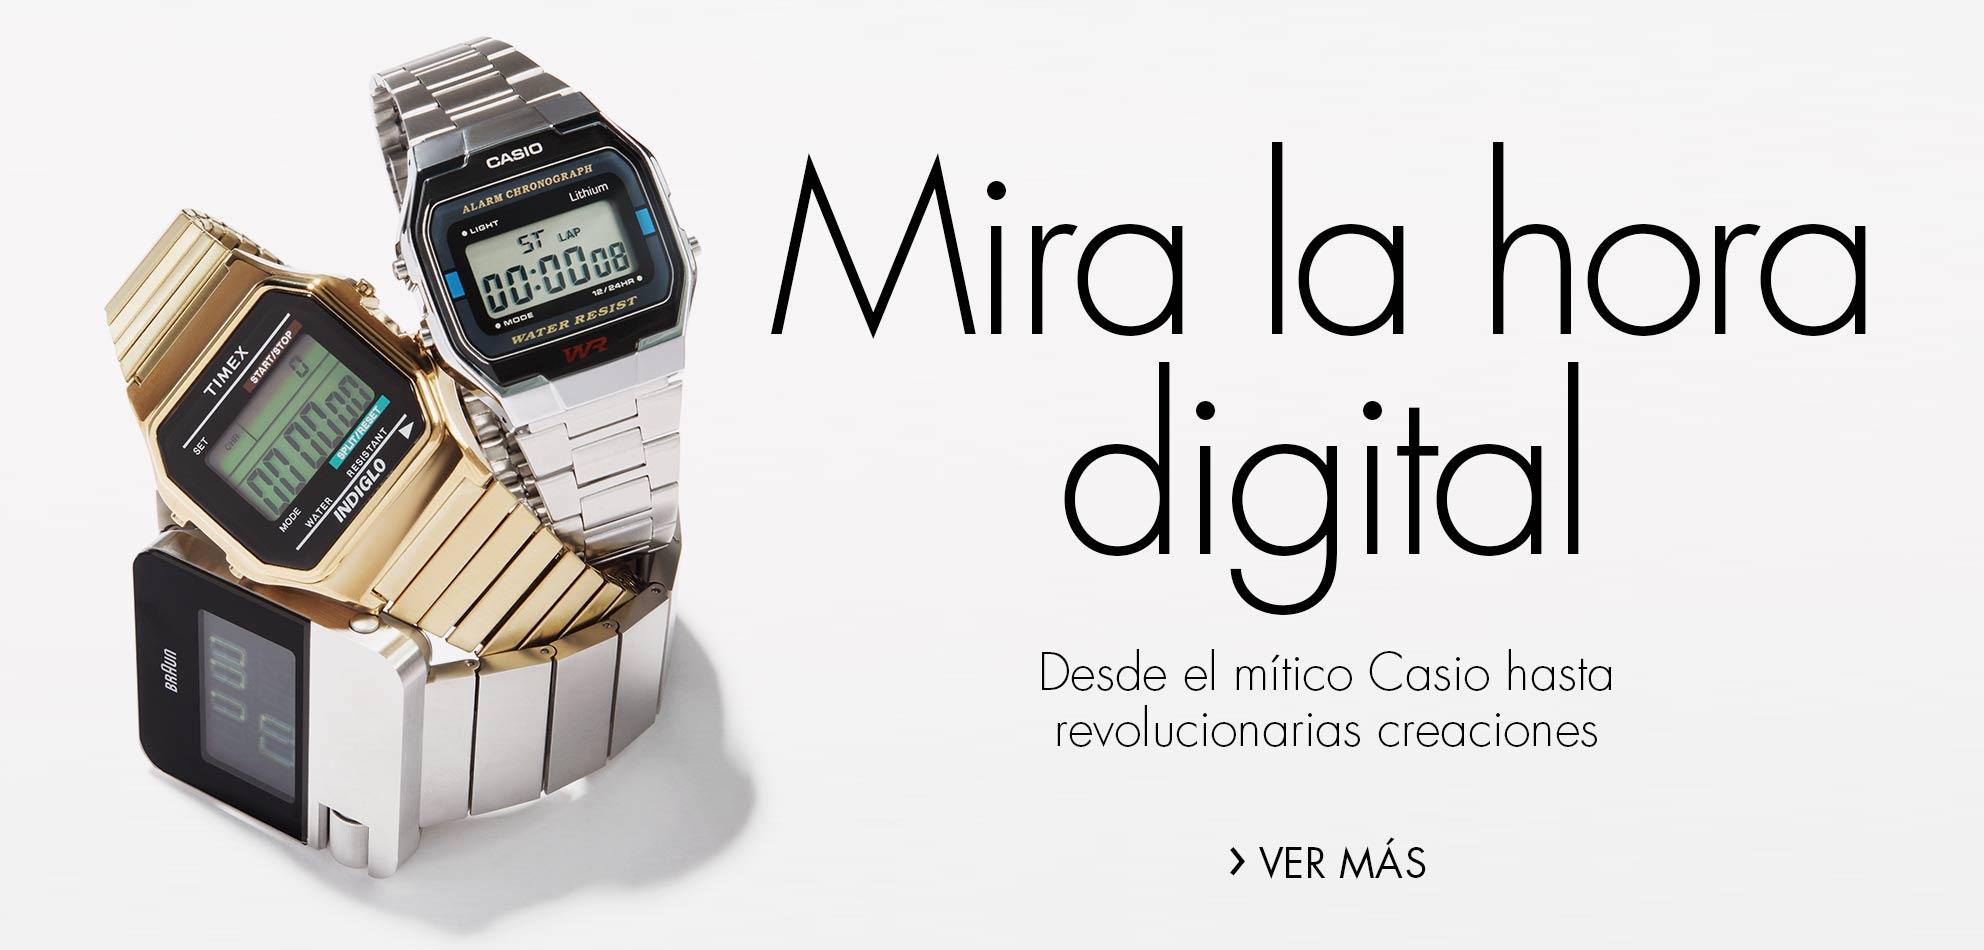 Mira la hora digital